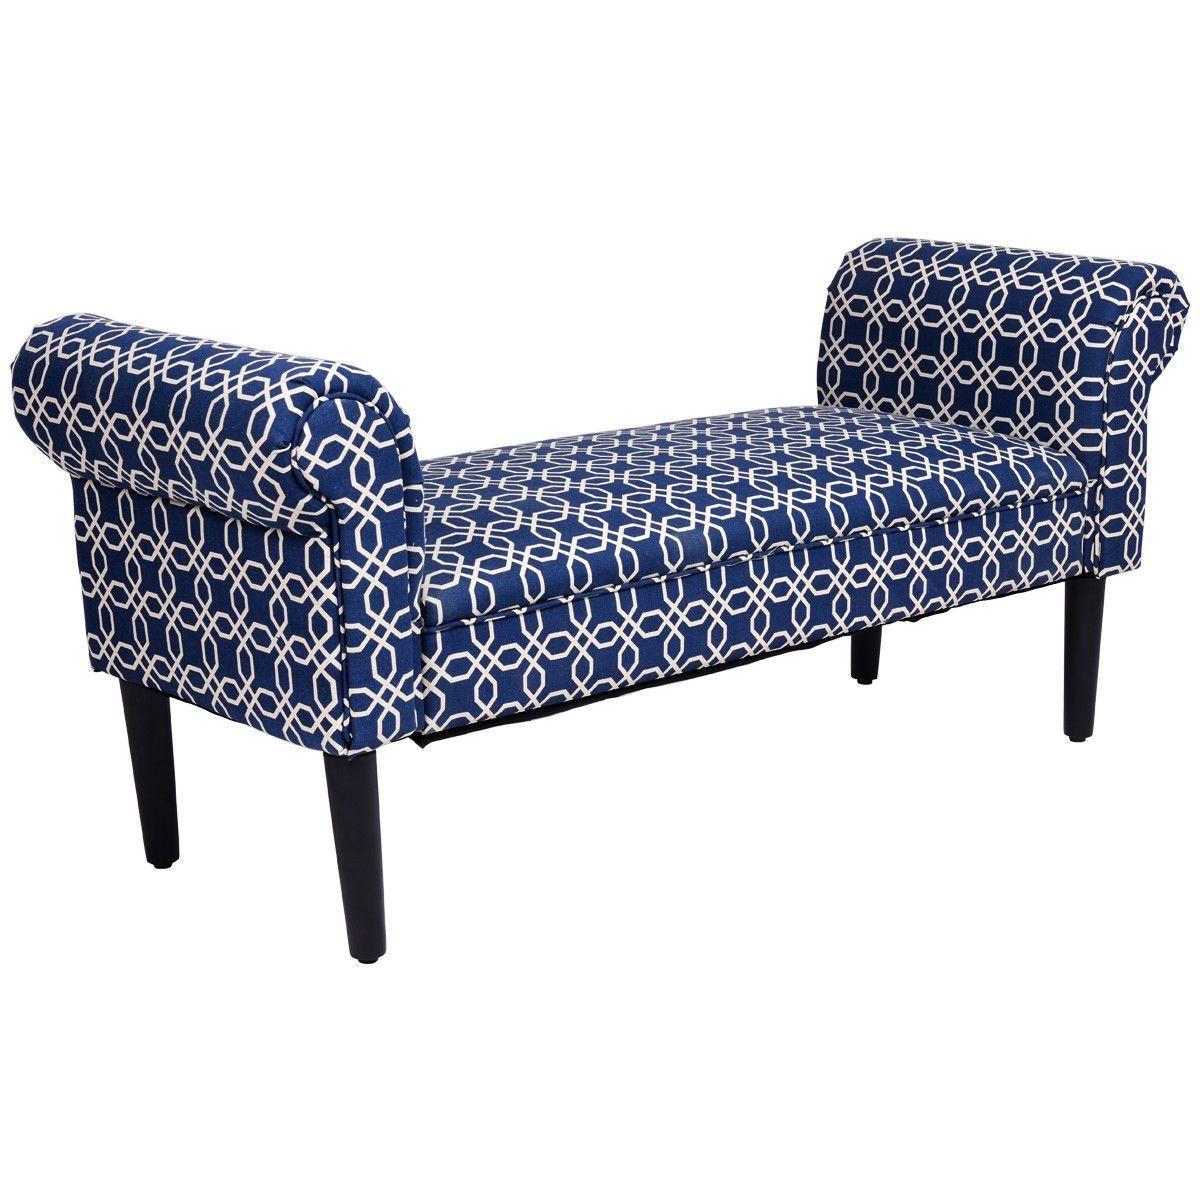 53 5 Modern Padded Bedroom Sofa Bench In 2019 Instagram Posts